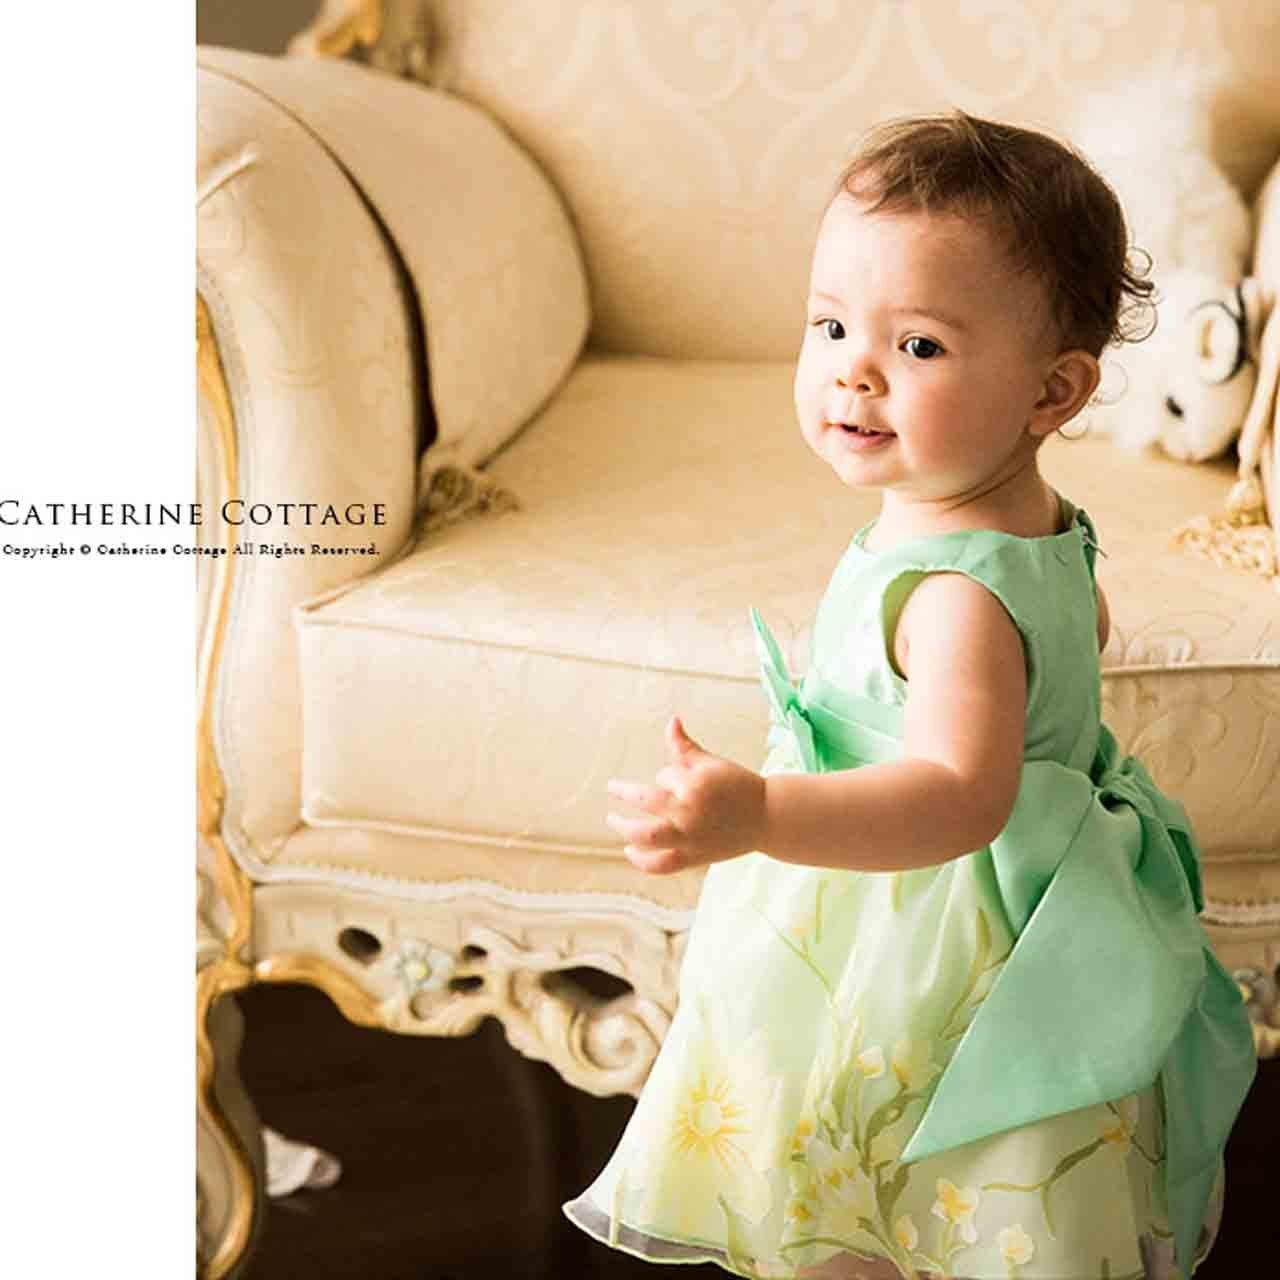 21343576e54ab Amazon.co.jp: Catherine Cottage 結婚式 出産祝い お遊戯会 花柄 オーガンジー ドレス ベビー 女の子 CC0399   服&ファッション小物